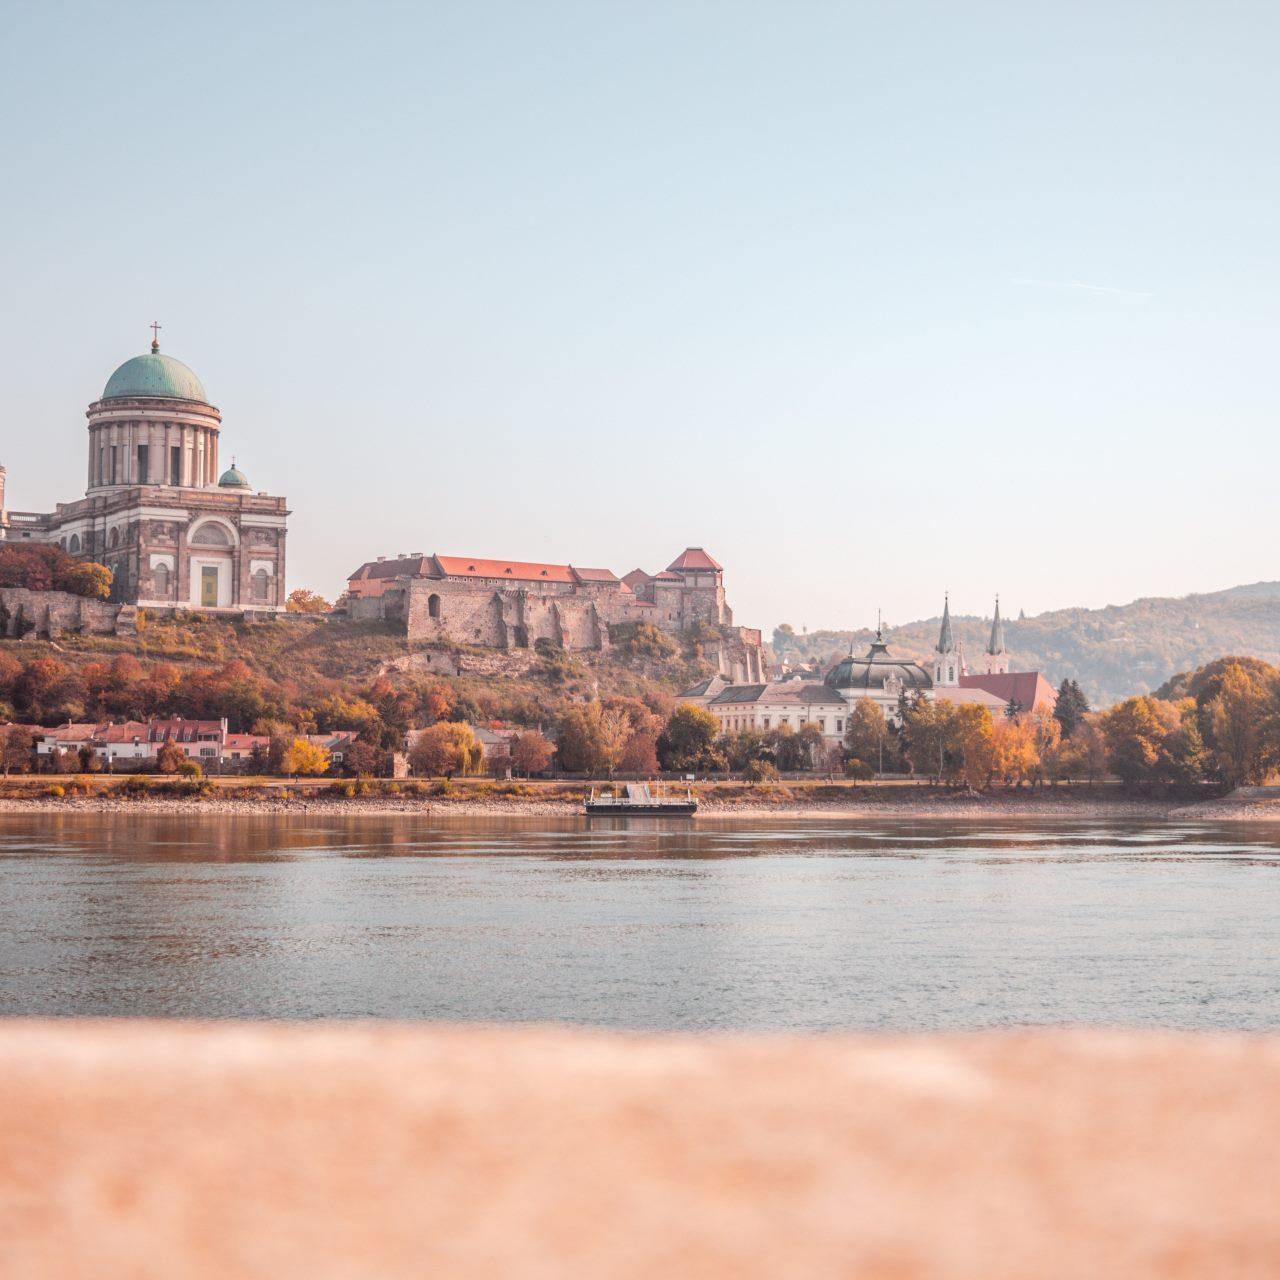 https://silvija-turist.hr/wp-content/uploads/2019/01/budimpesta-1280x1280.jpg